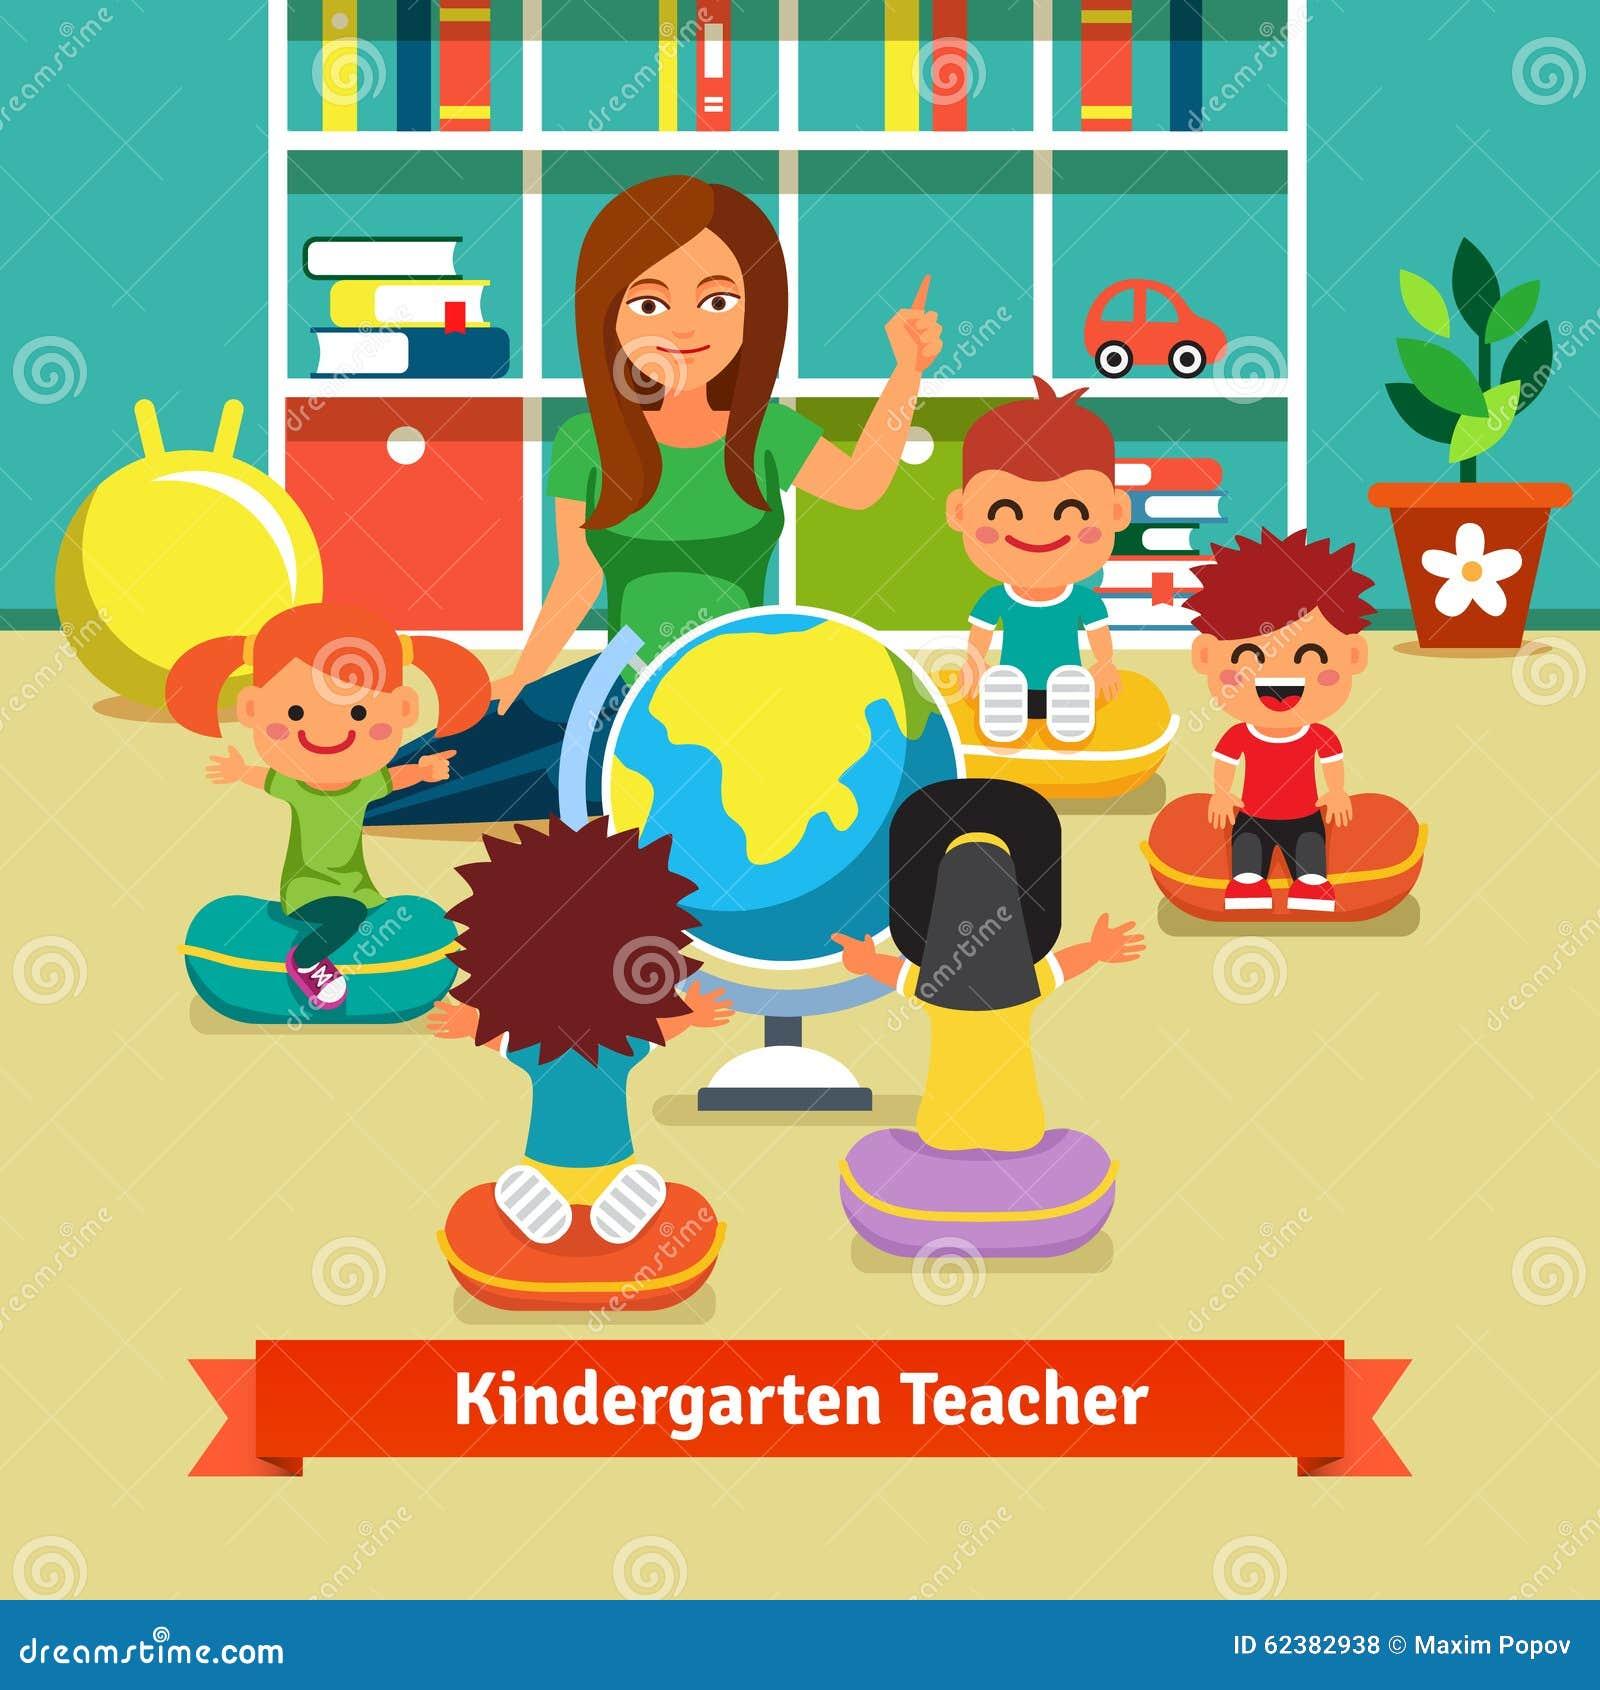 kindergarten teacher teaching kids geography stock vector bookshelf clipart image bookshelf clipart image